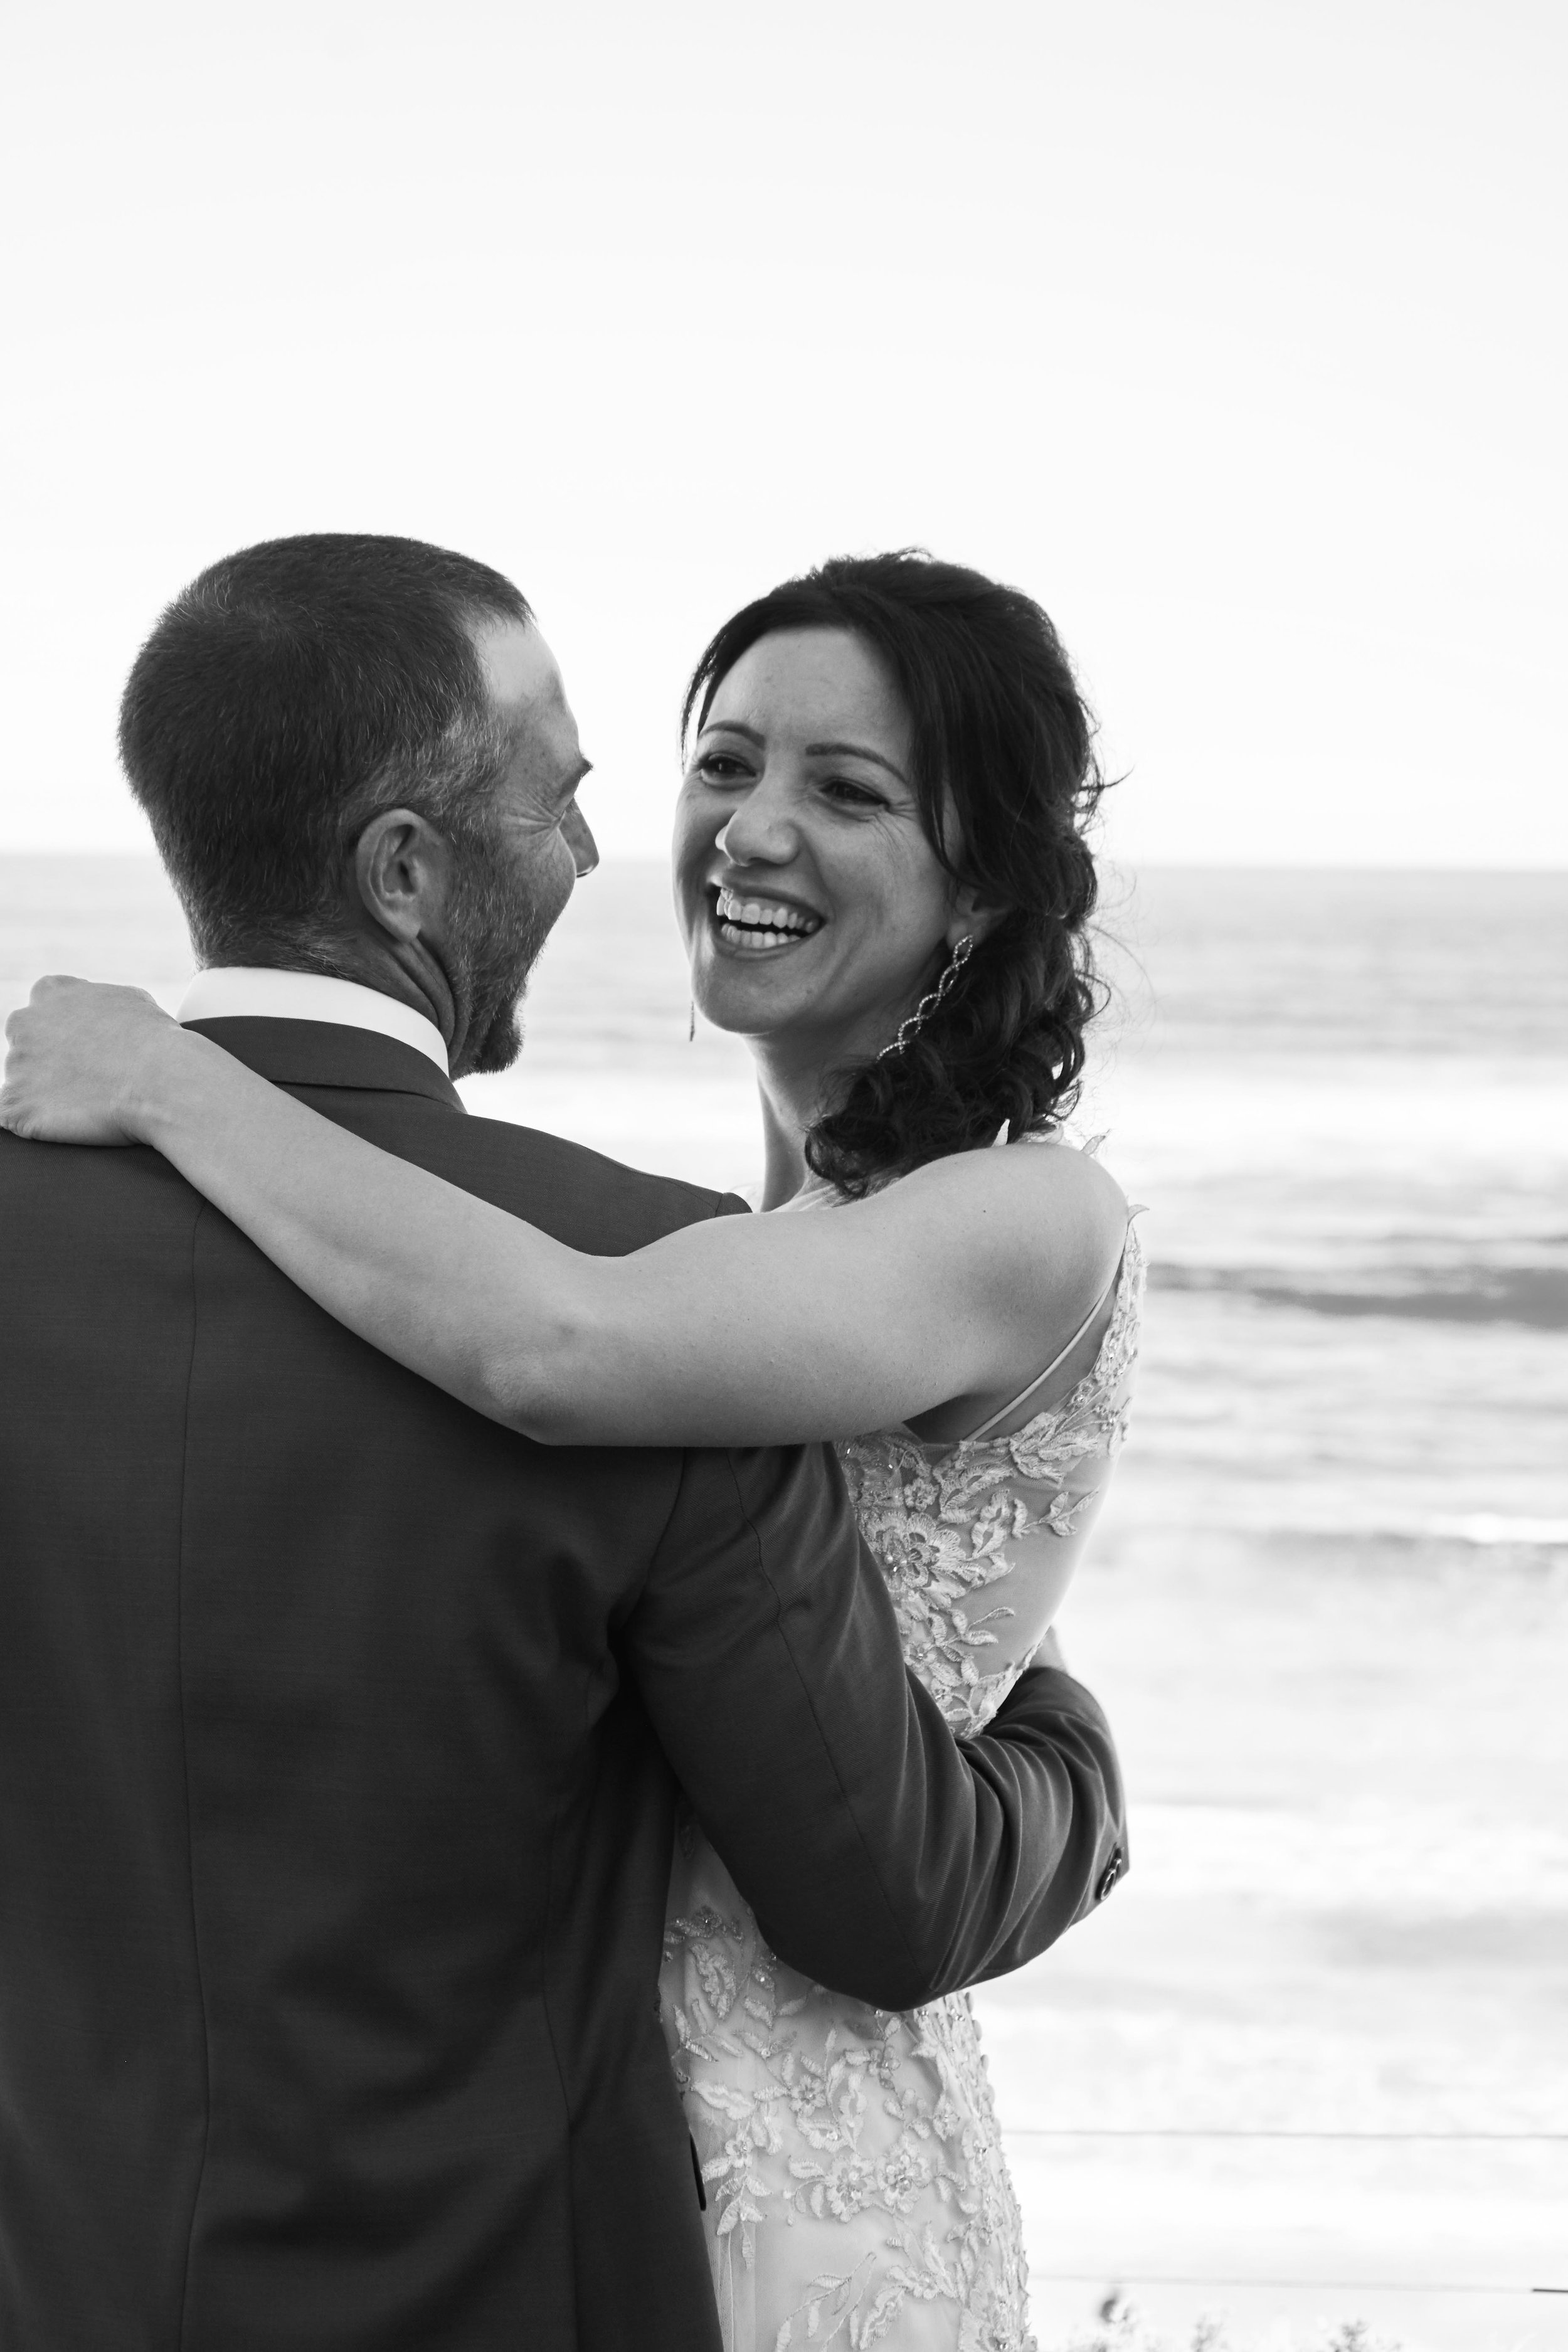 sorrento-wedding-photography-all-smiles-marissa-jade-photography-76.jpg